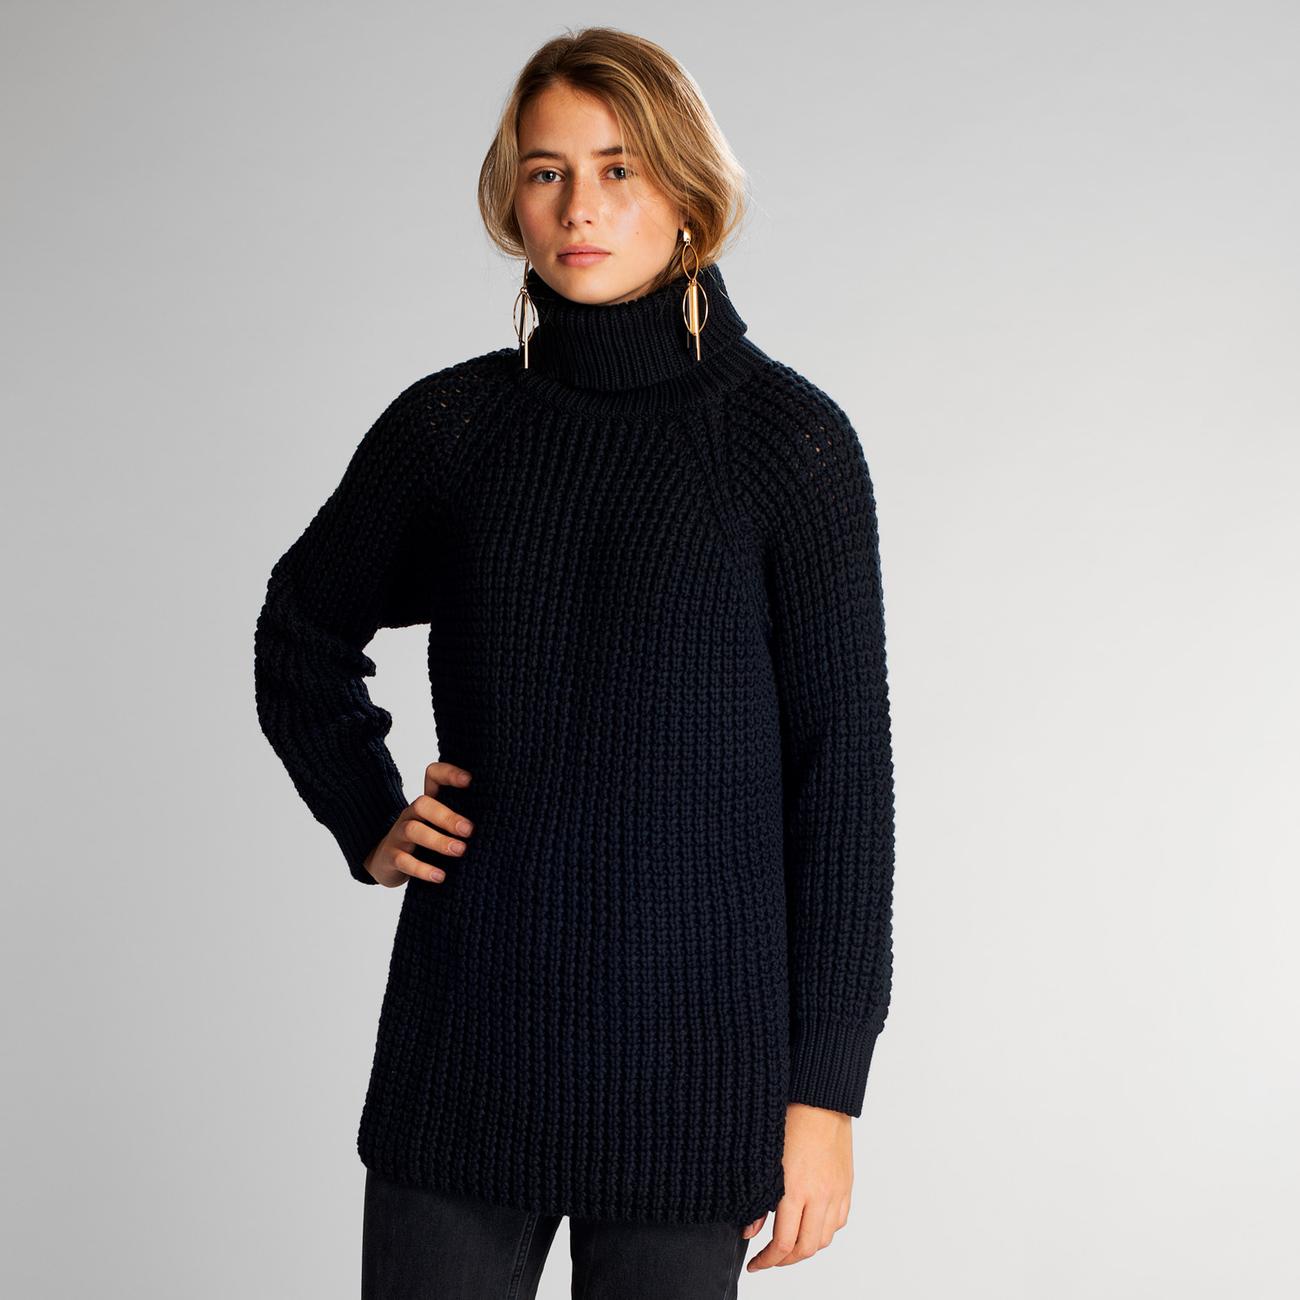 Sweater Oslo Black